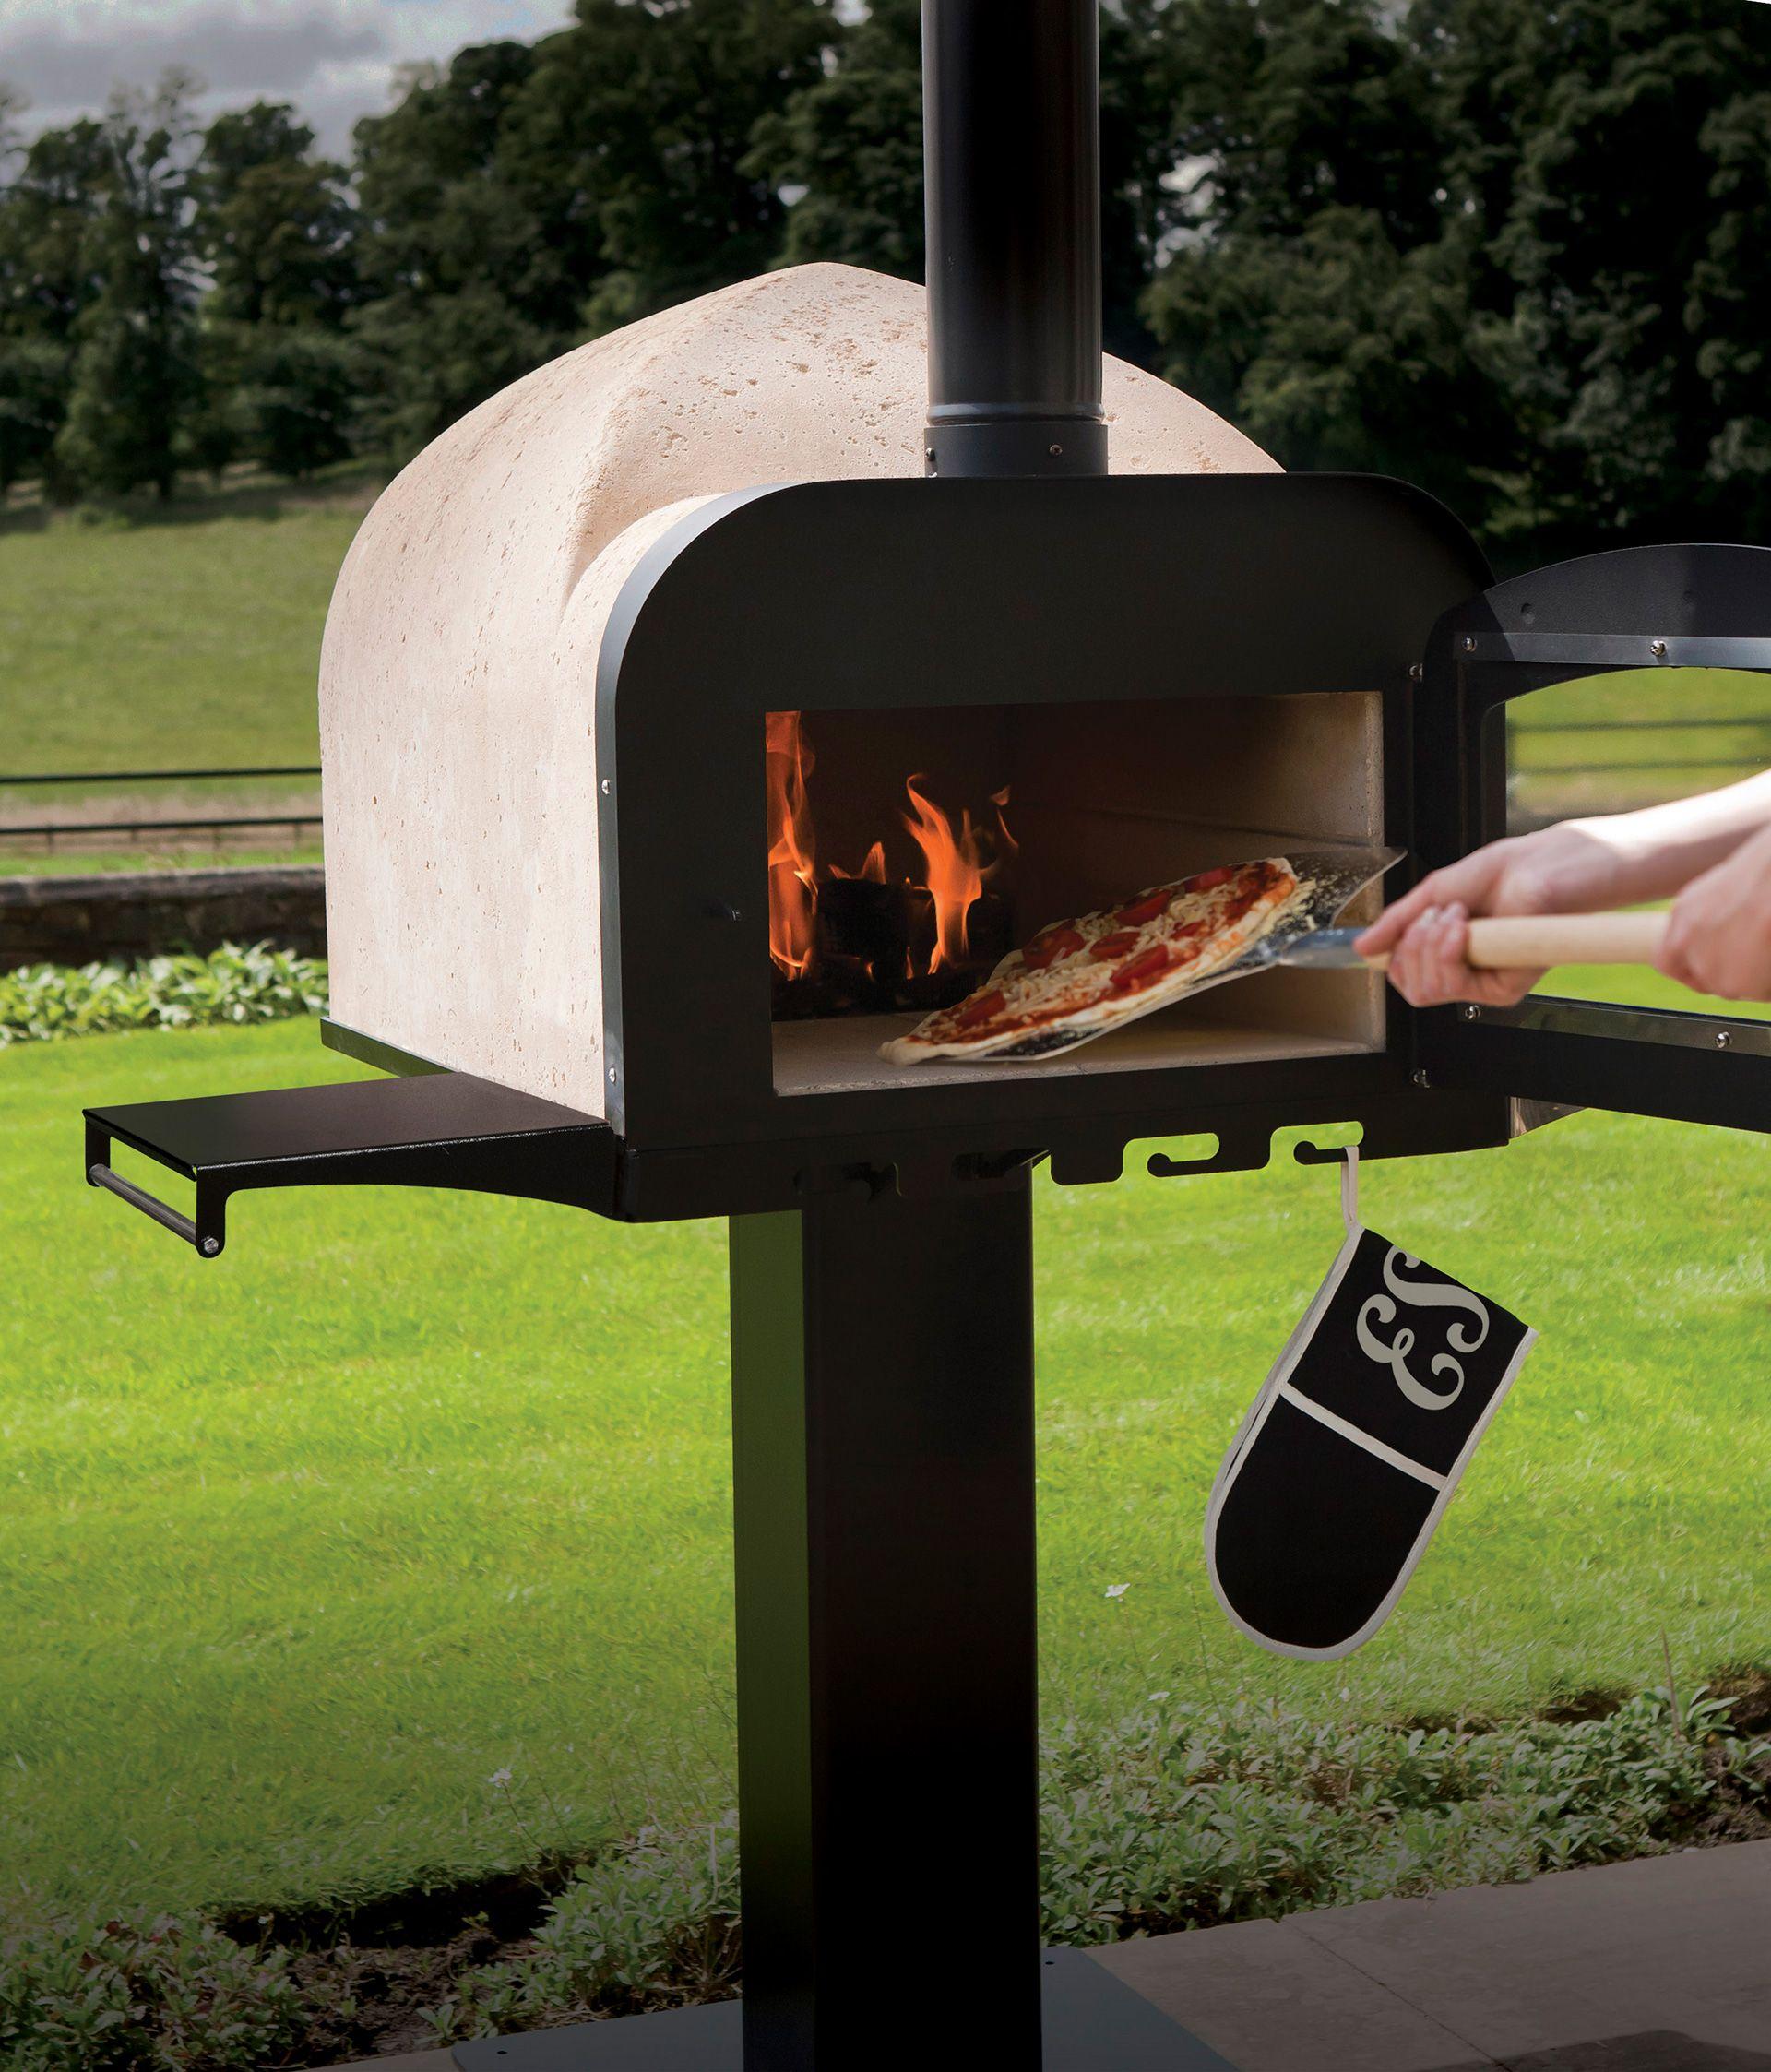 Fire stone cooking demonstration at merritt fryers